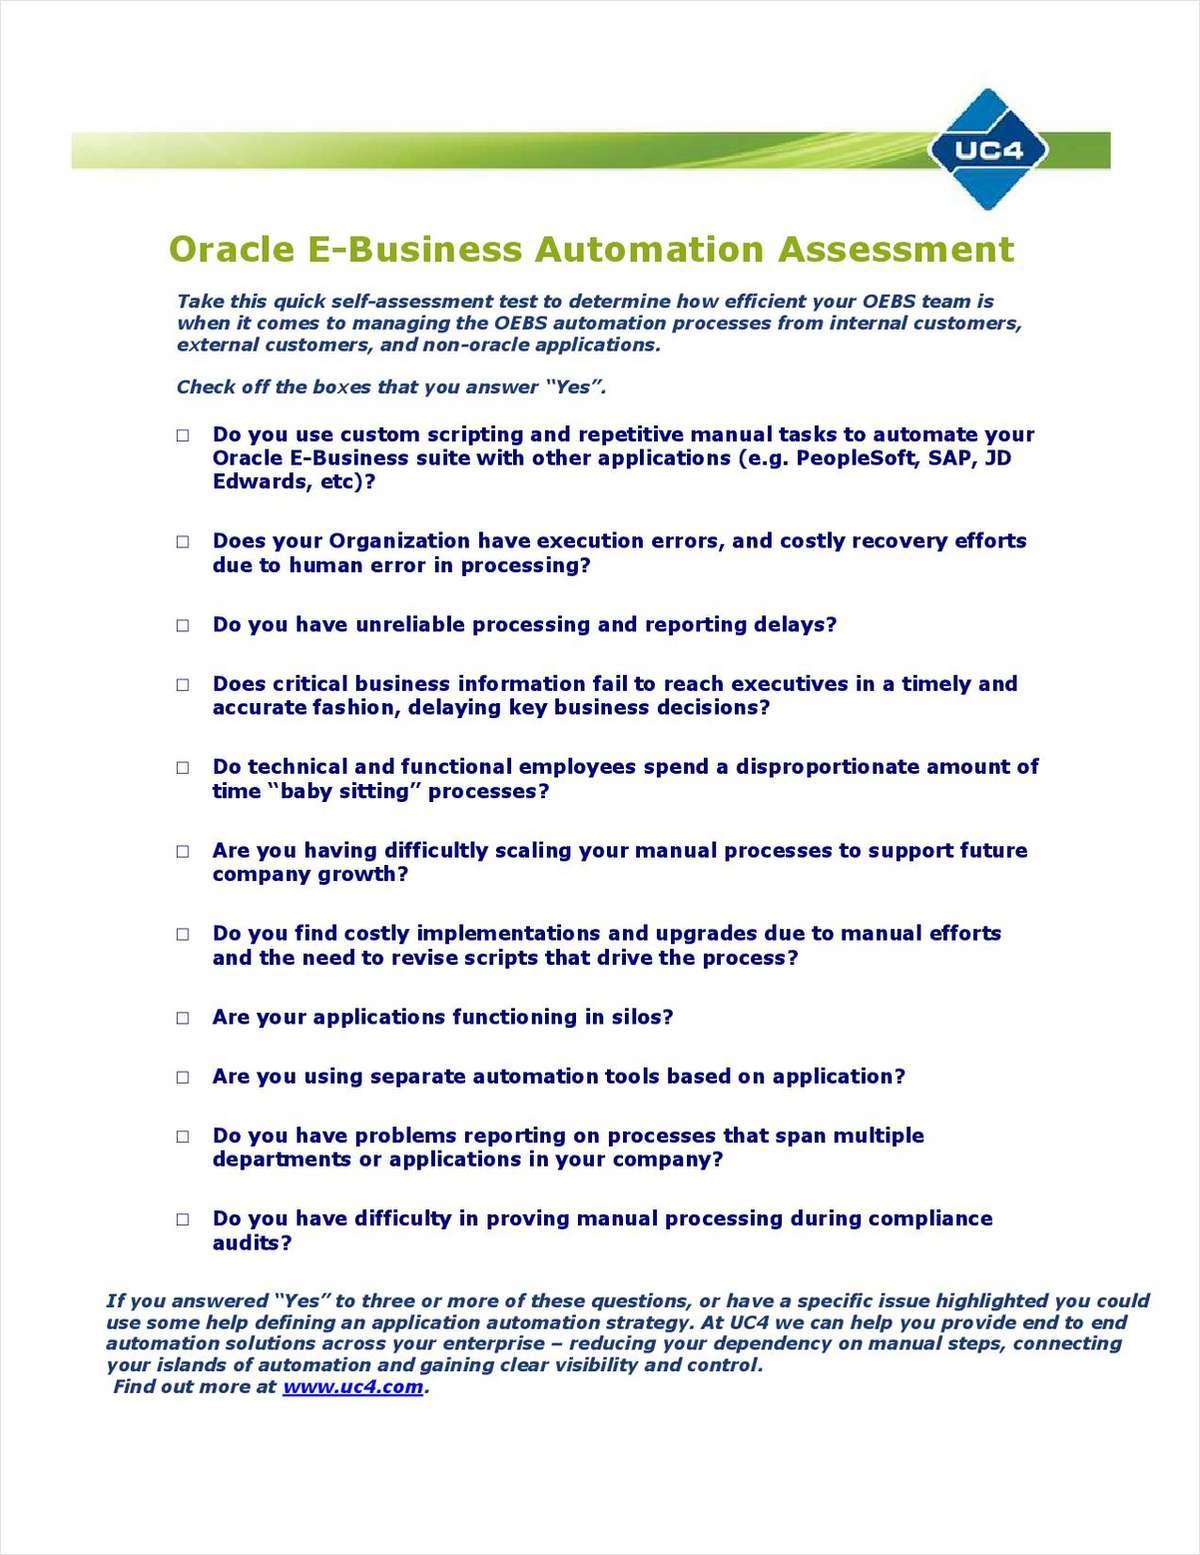 Oracle E-Business Suite Automation Kit